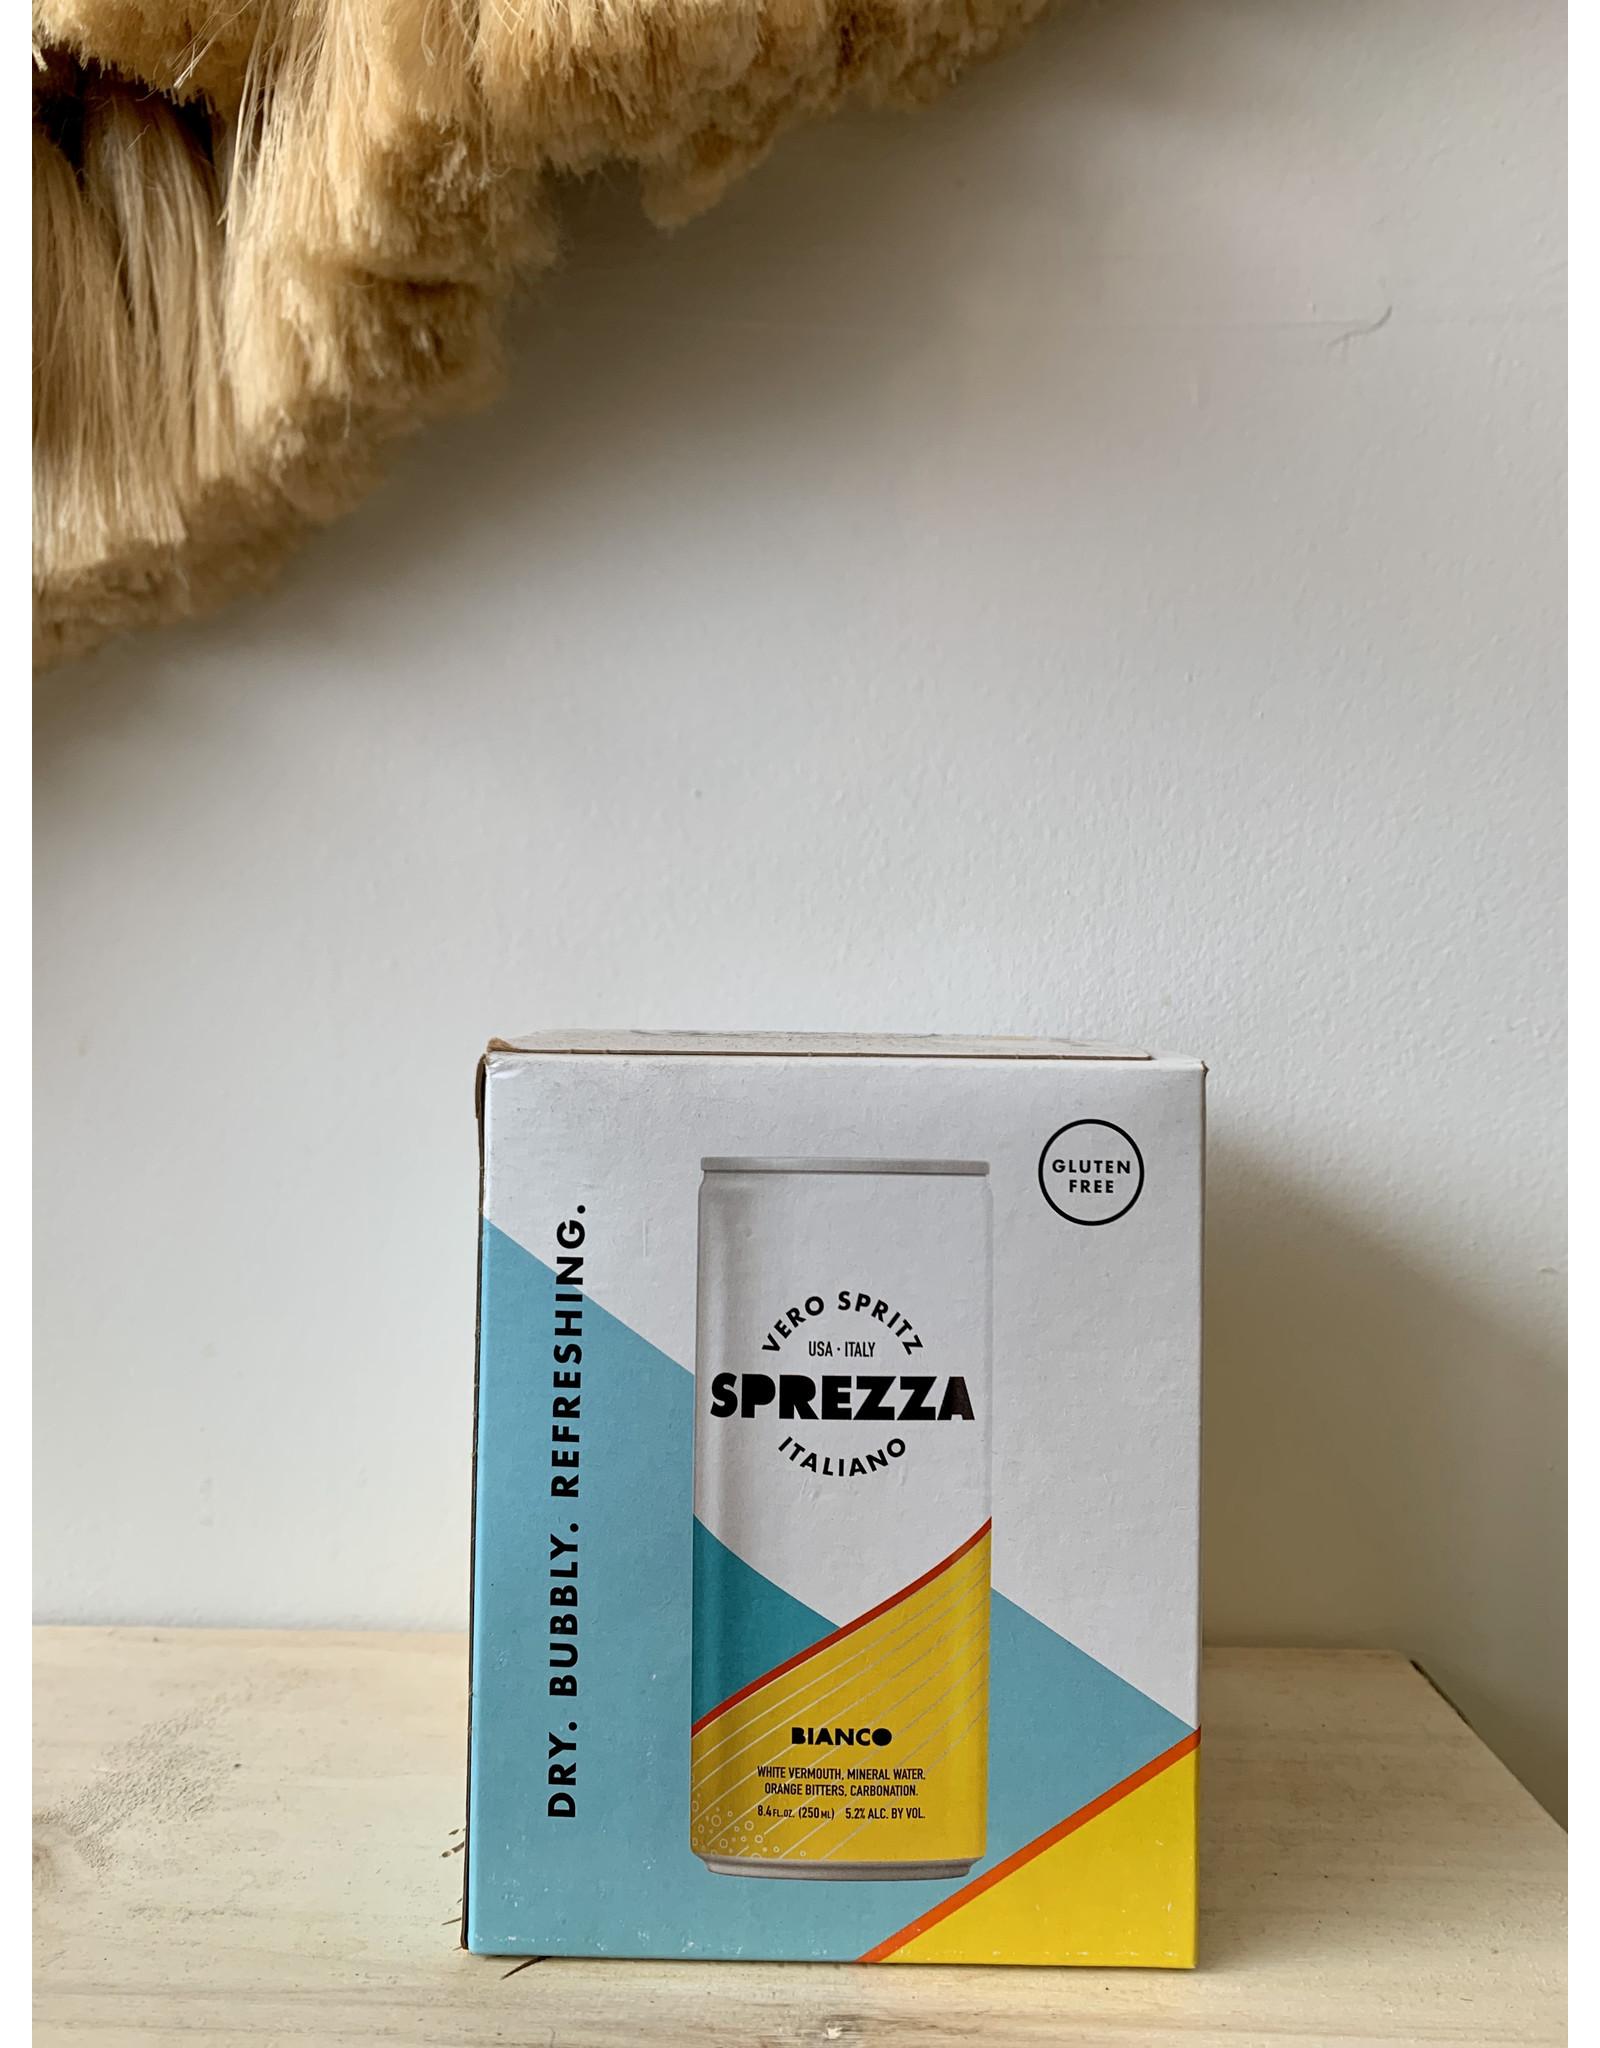 Sprezza Vero Spritz Bianco 4 Pack